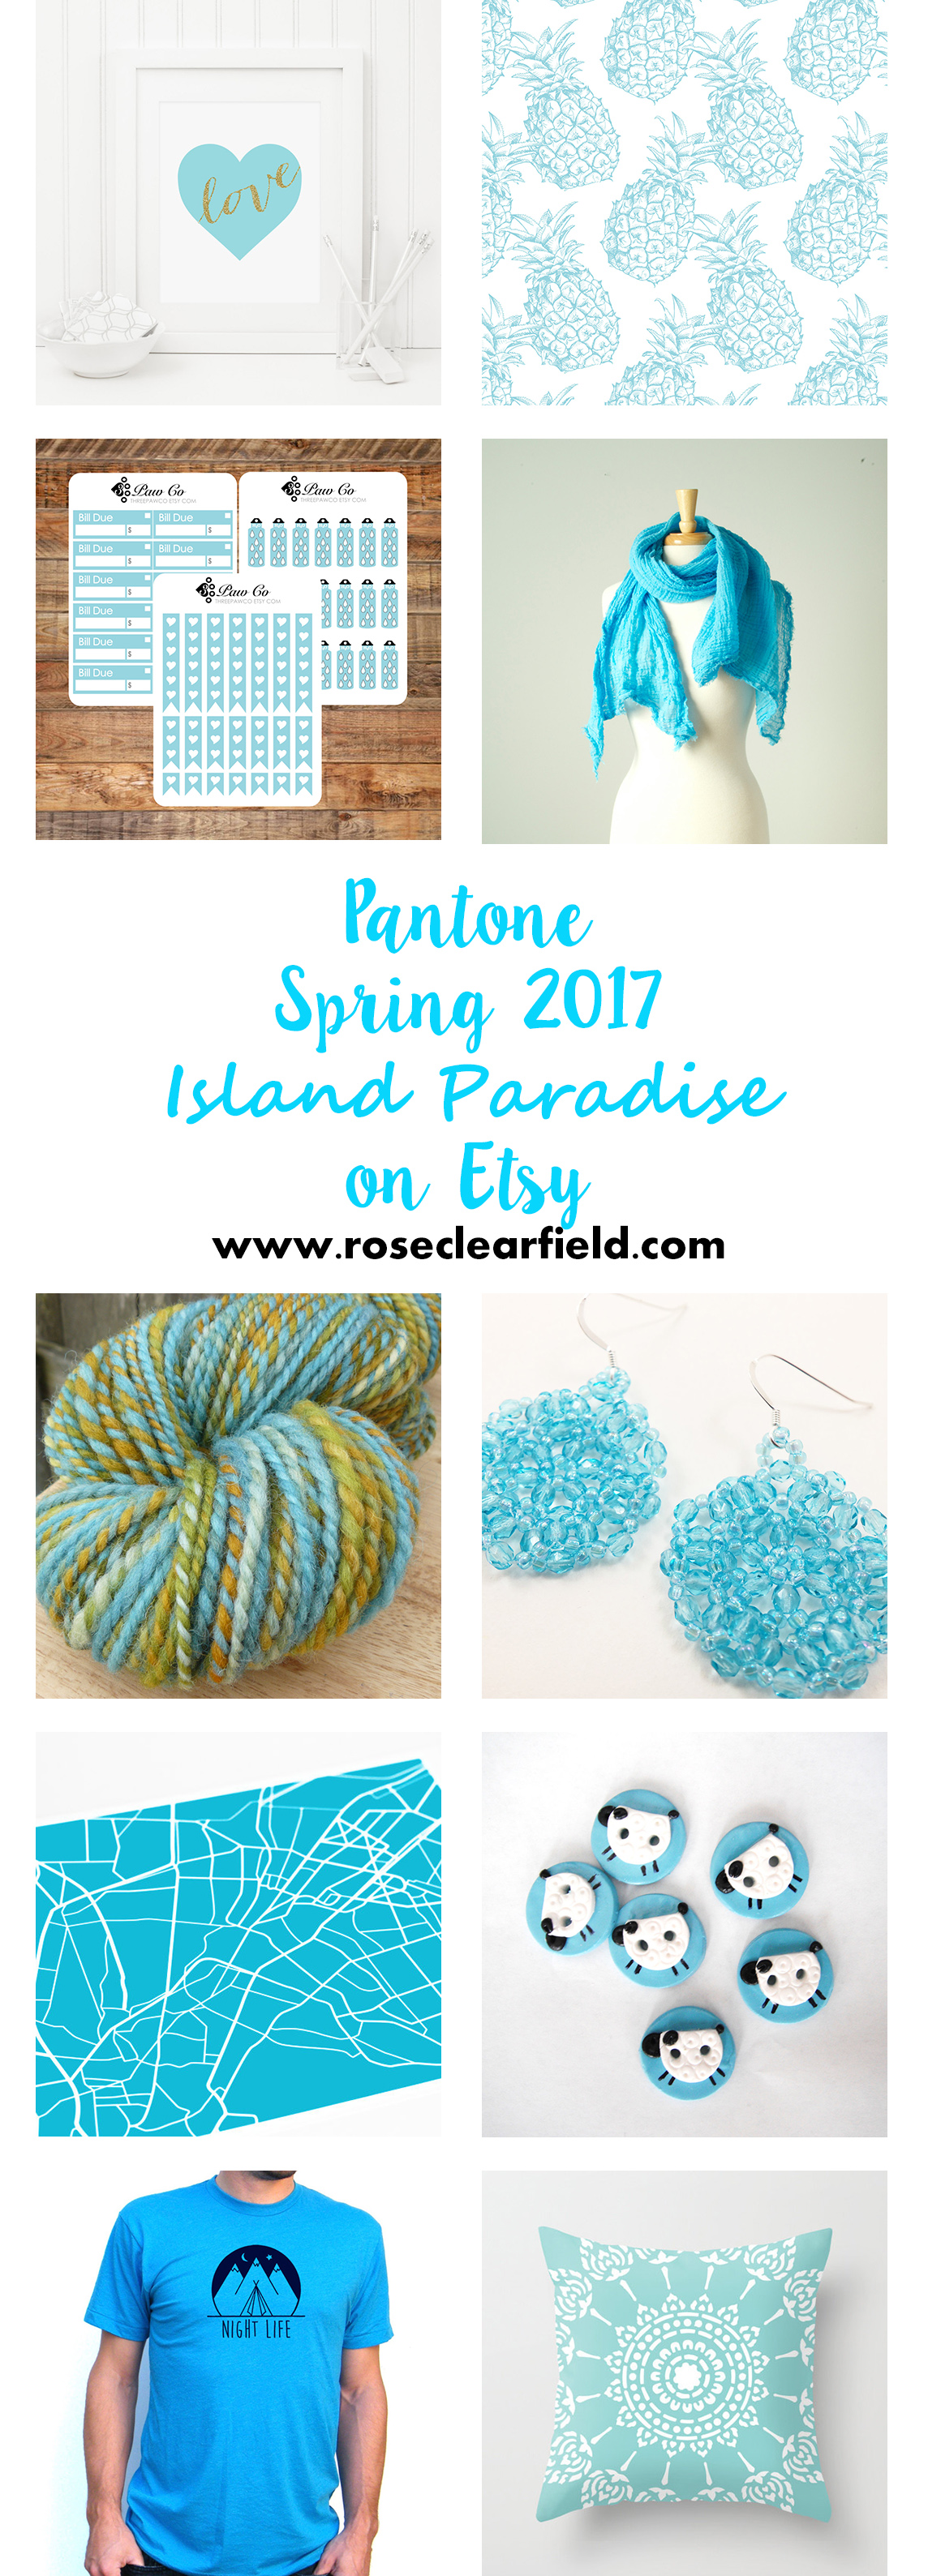 Pantone Spring 2017 Island Paradise Etsy Picks | https://www.roseclearfield.com